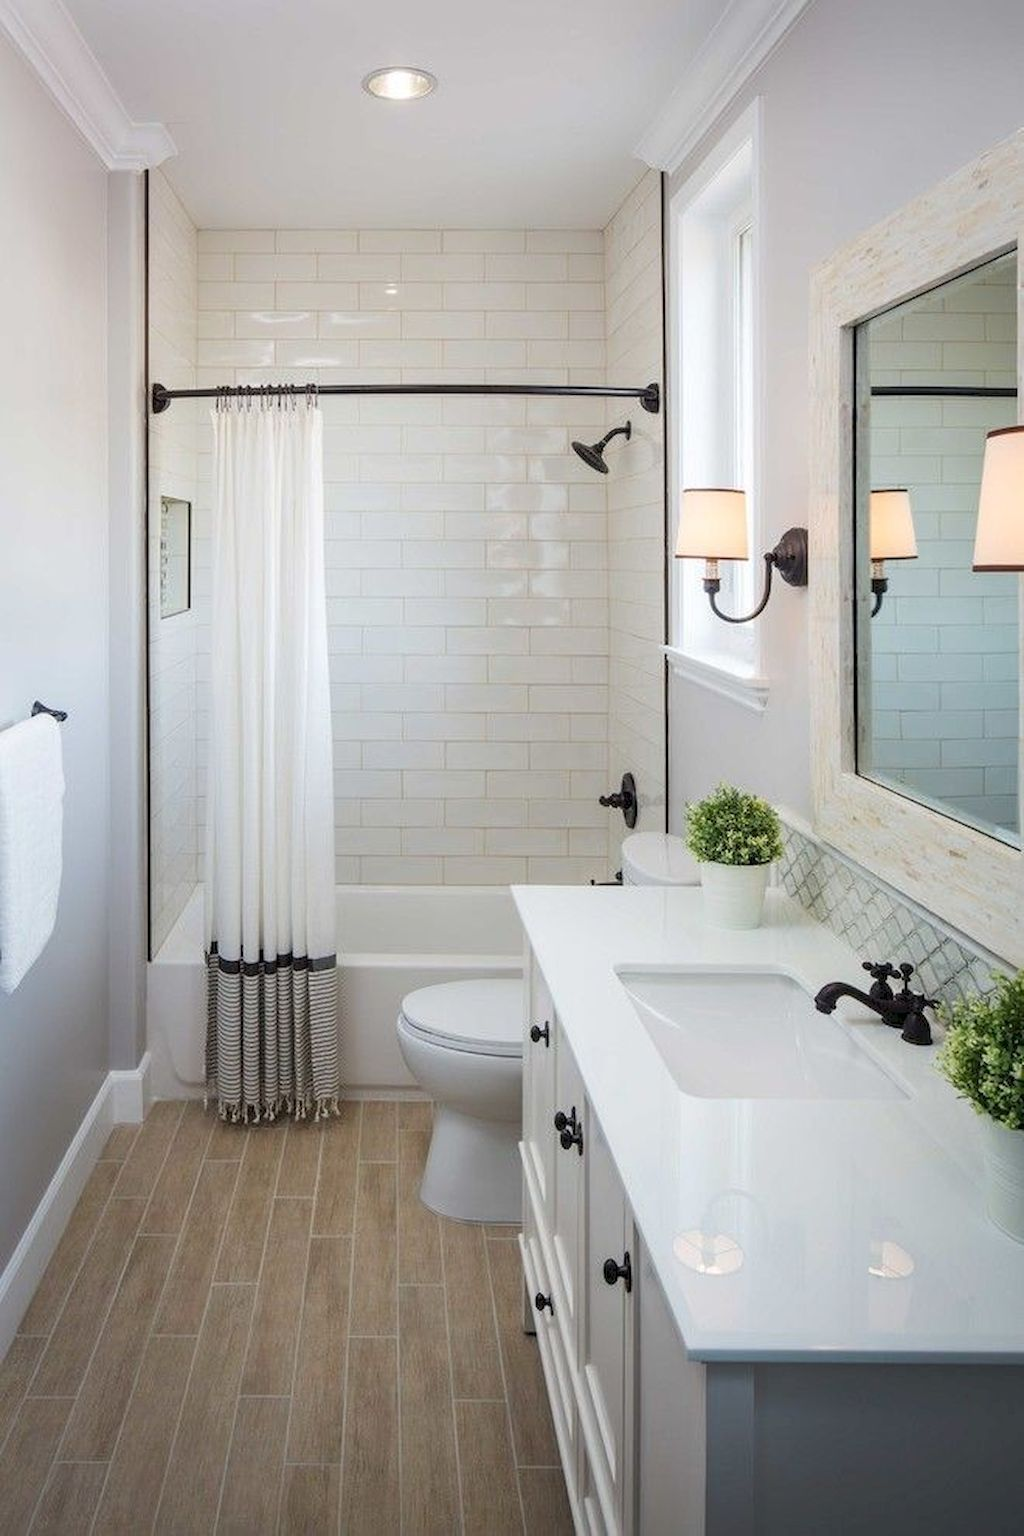 70 inspiring farmhouse bathroom shower decor ideas and remodel to rh pinterest com